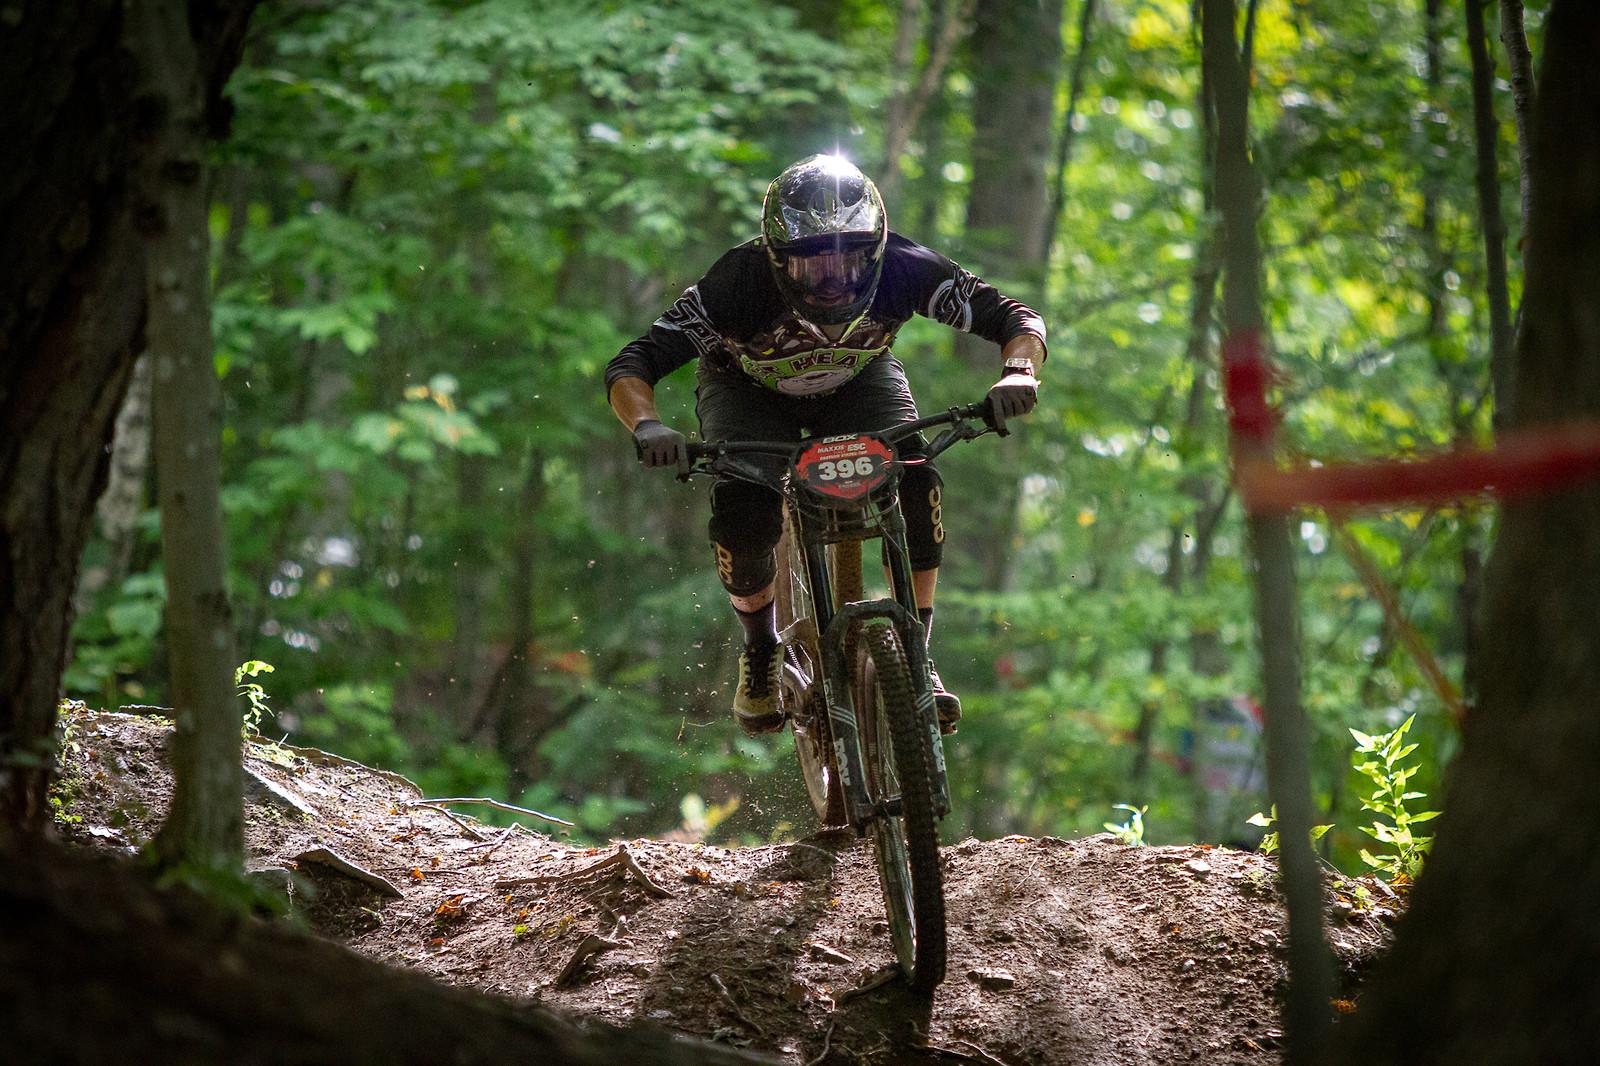 Greg Jackson - JackRice - Mountain Biking Pictures - Vital MTB